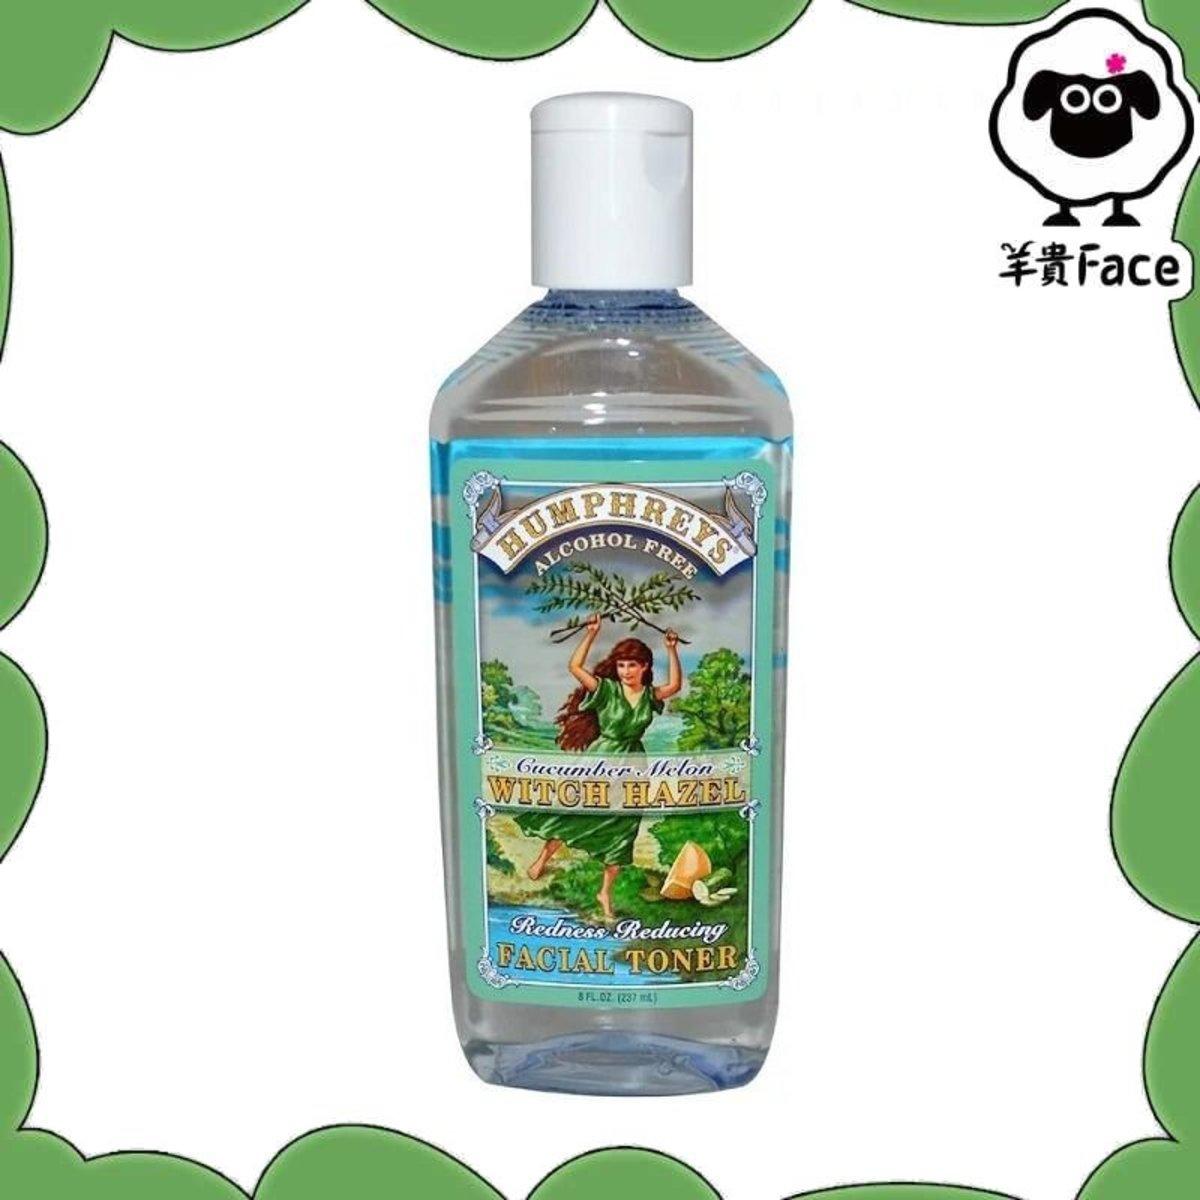 Redness Reducing Facial Toner, Cucumber Melon Witch Hazel, Alcohol Free, 8 fl oz (237 ml)